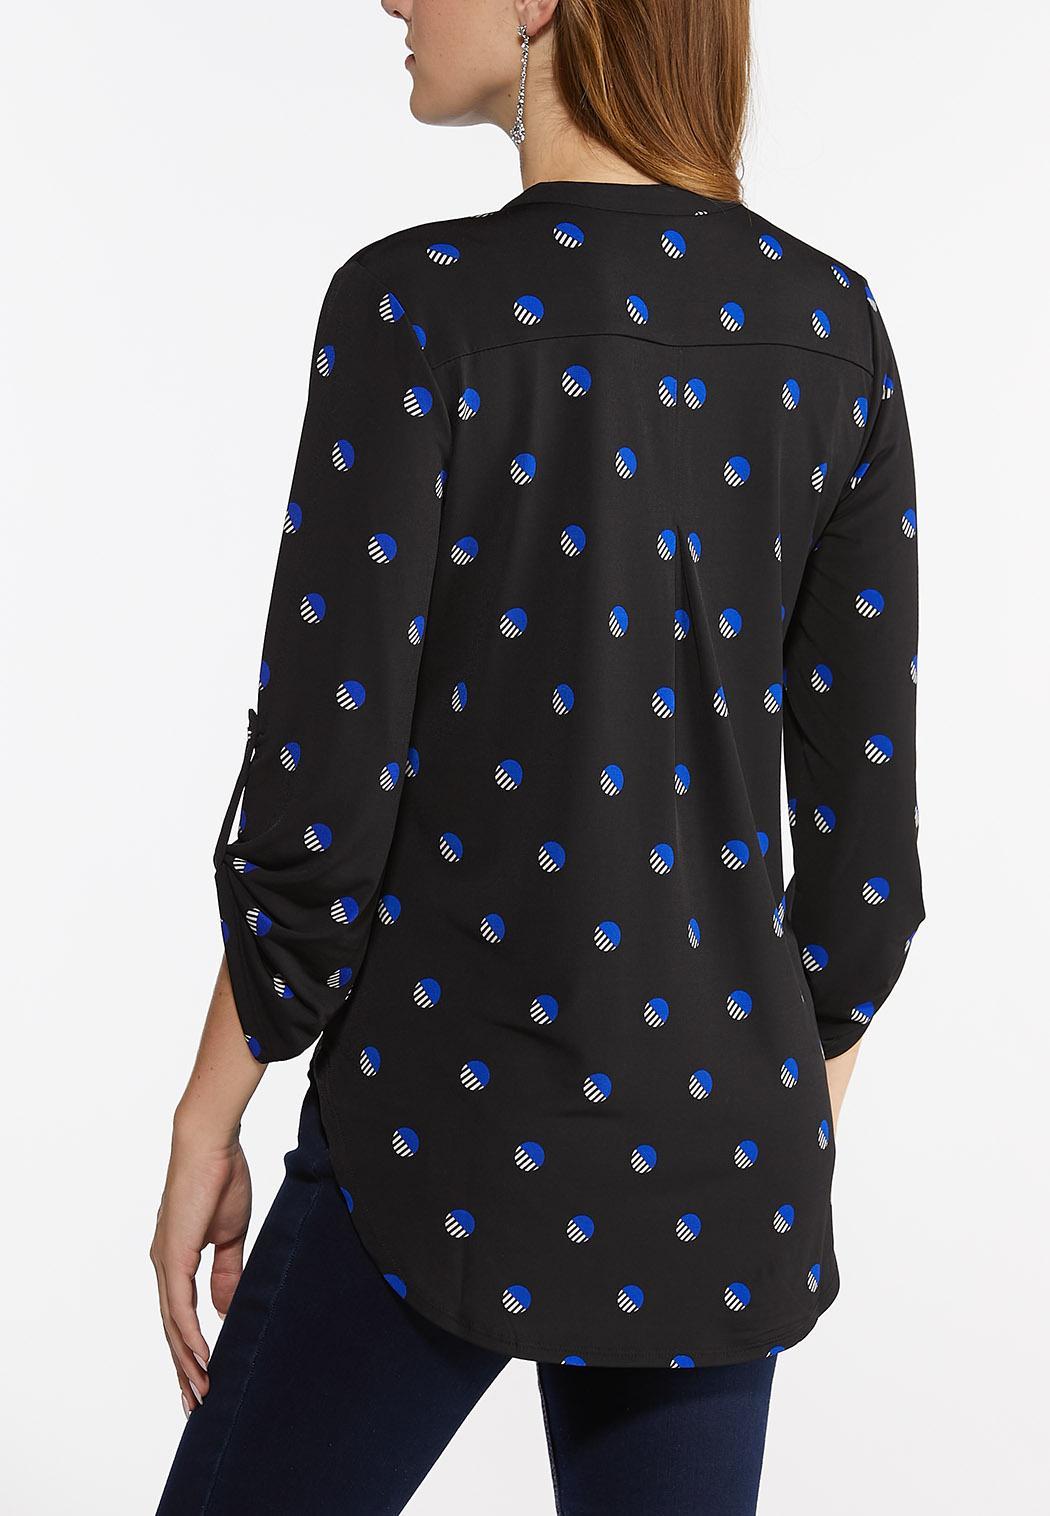 Plus Size Deco Top Pullover Top (Item #44441824)